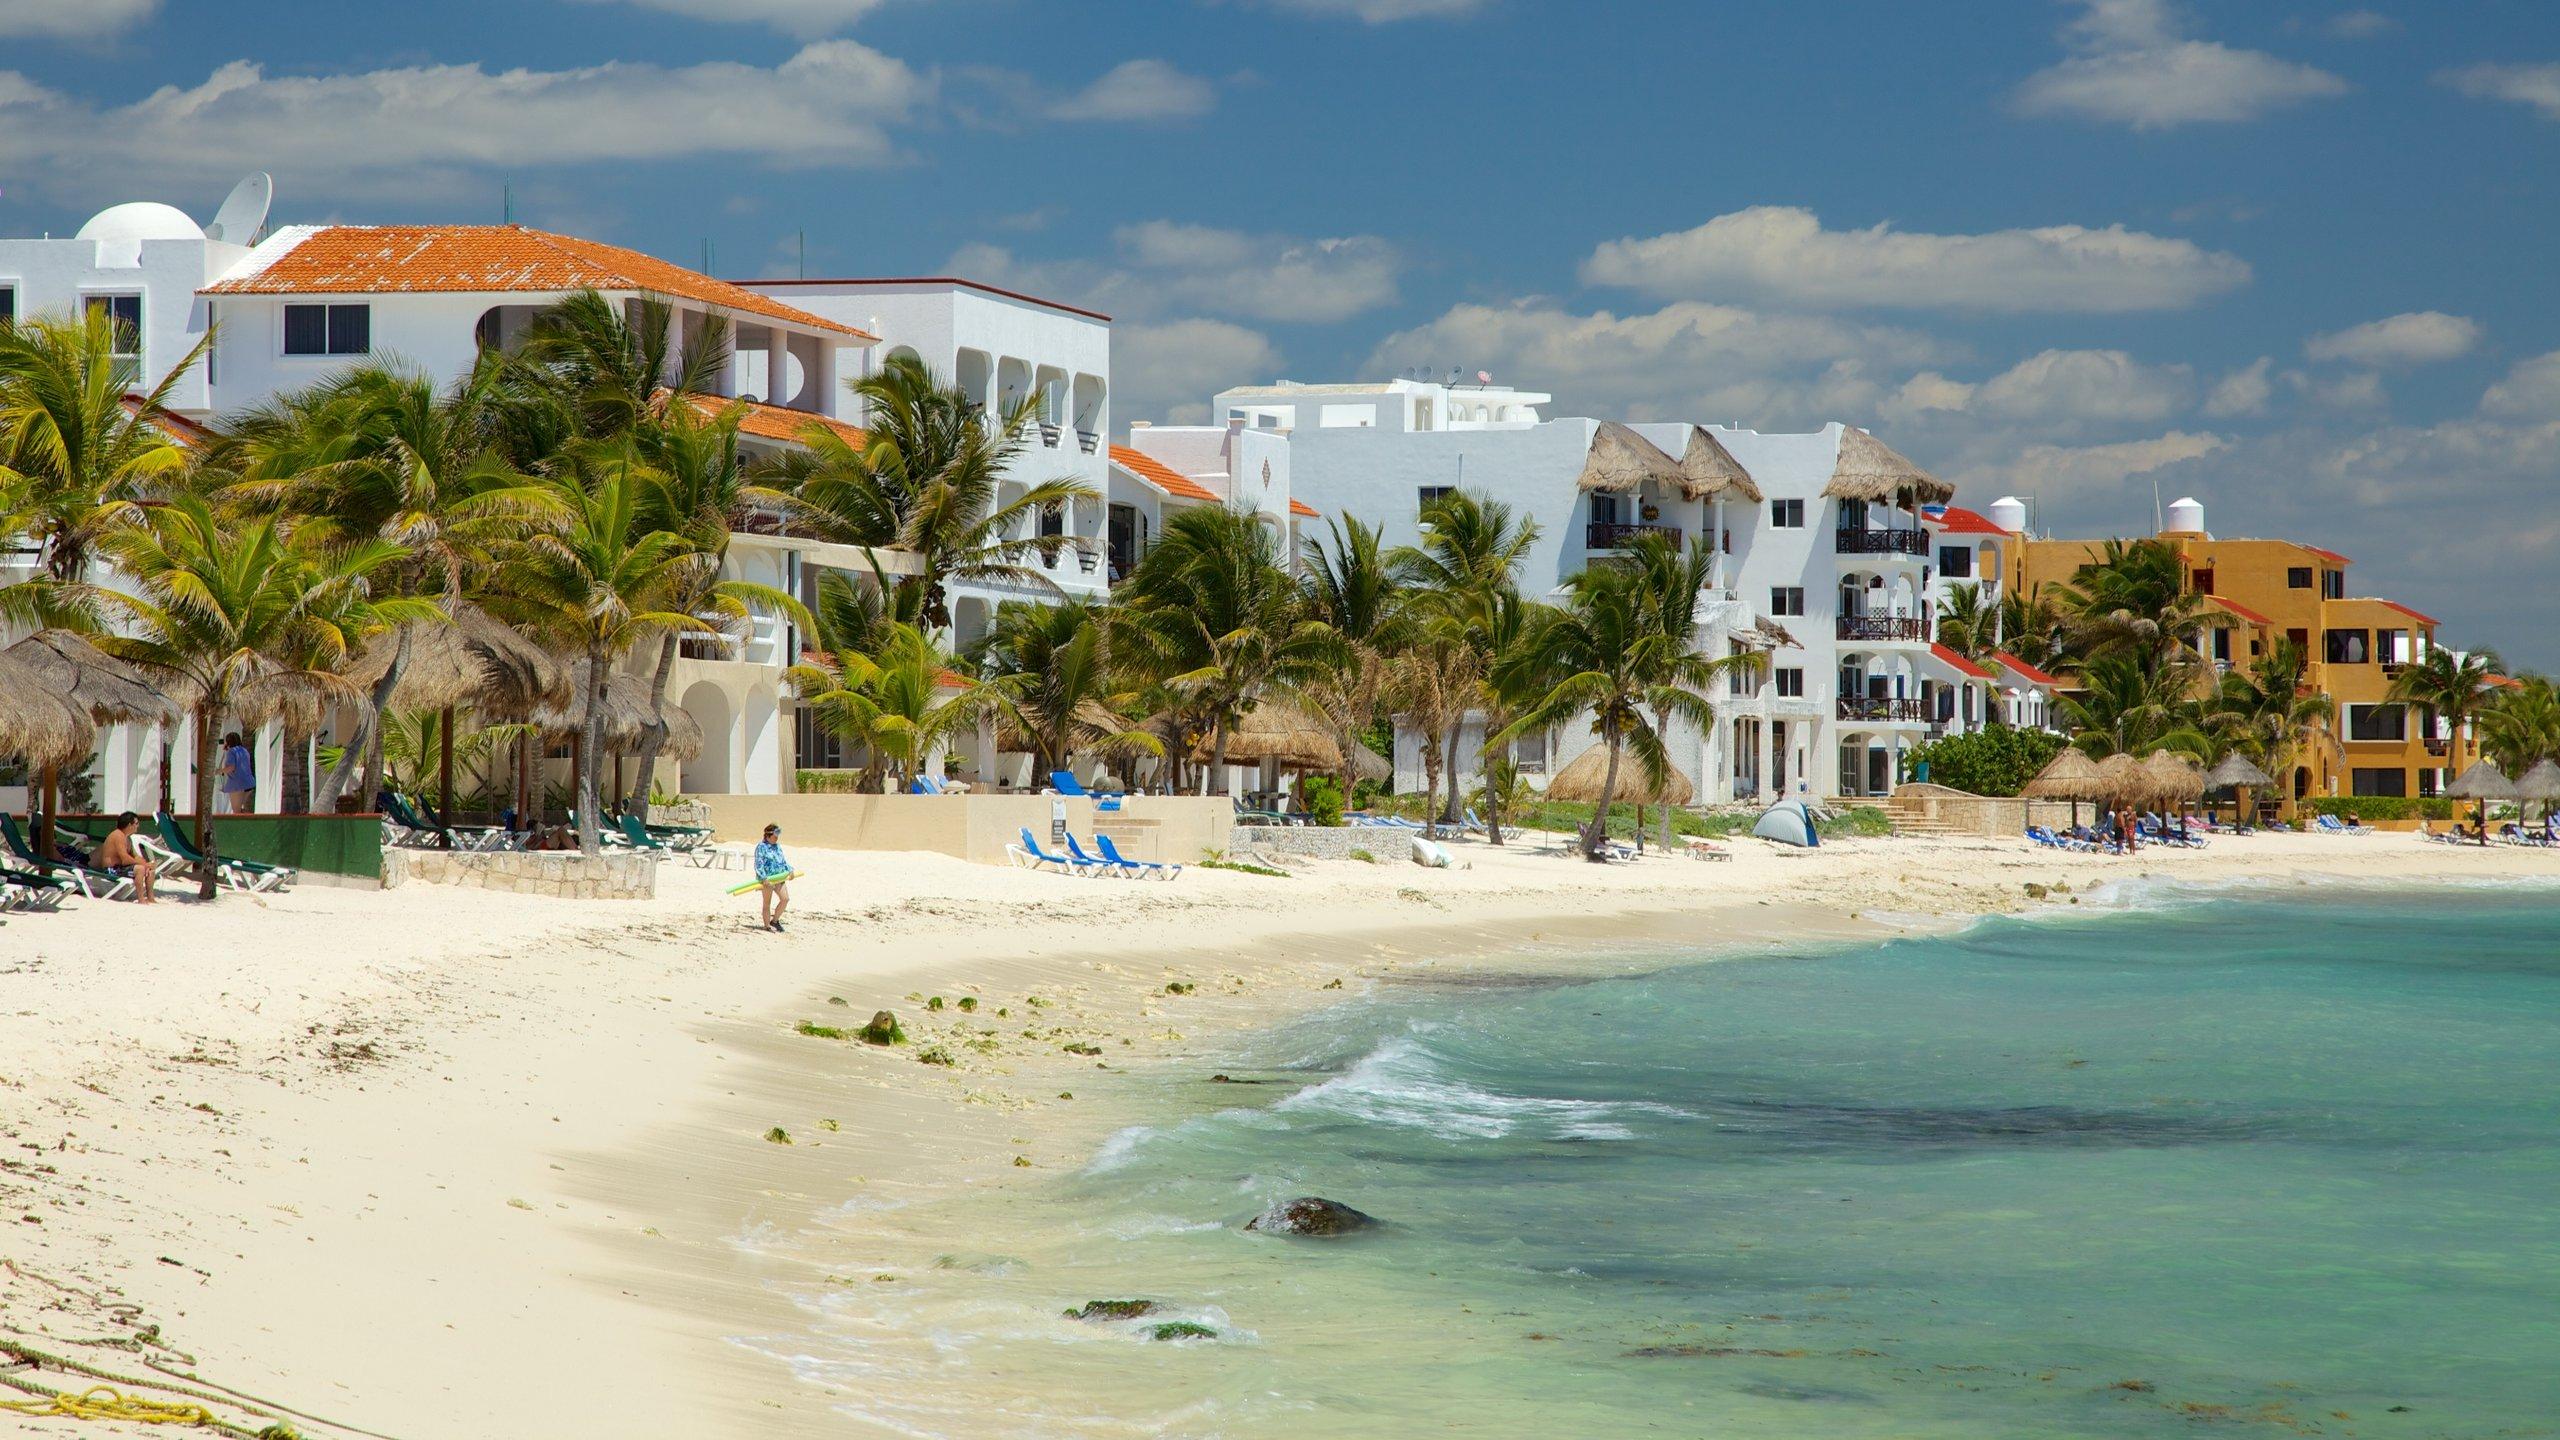 Akumal Beach, Akumal, Quintana Roo, Mexico